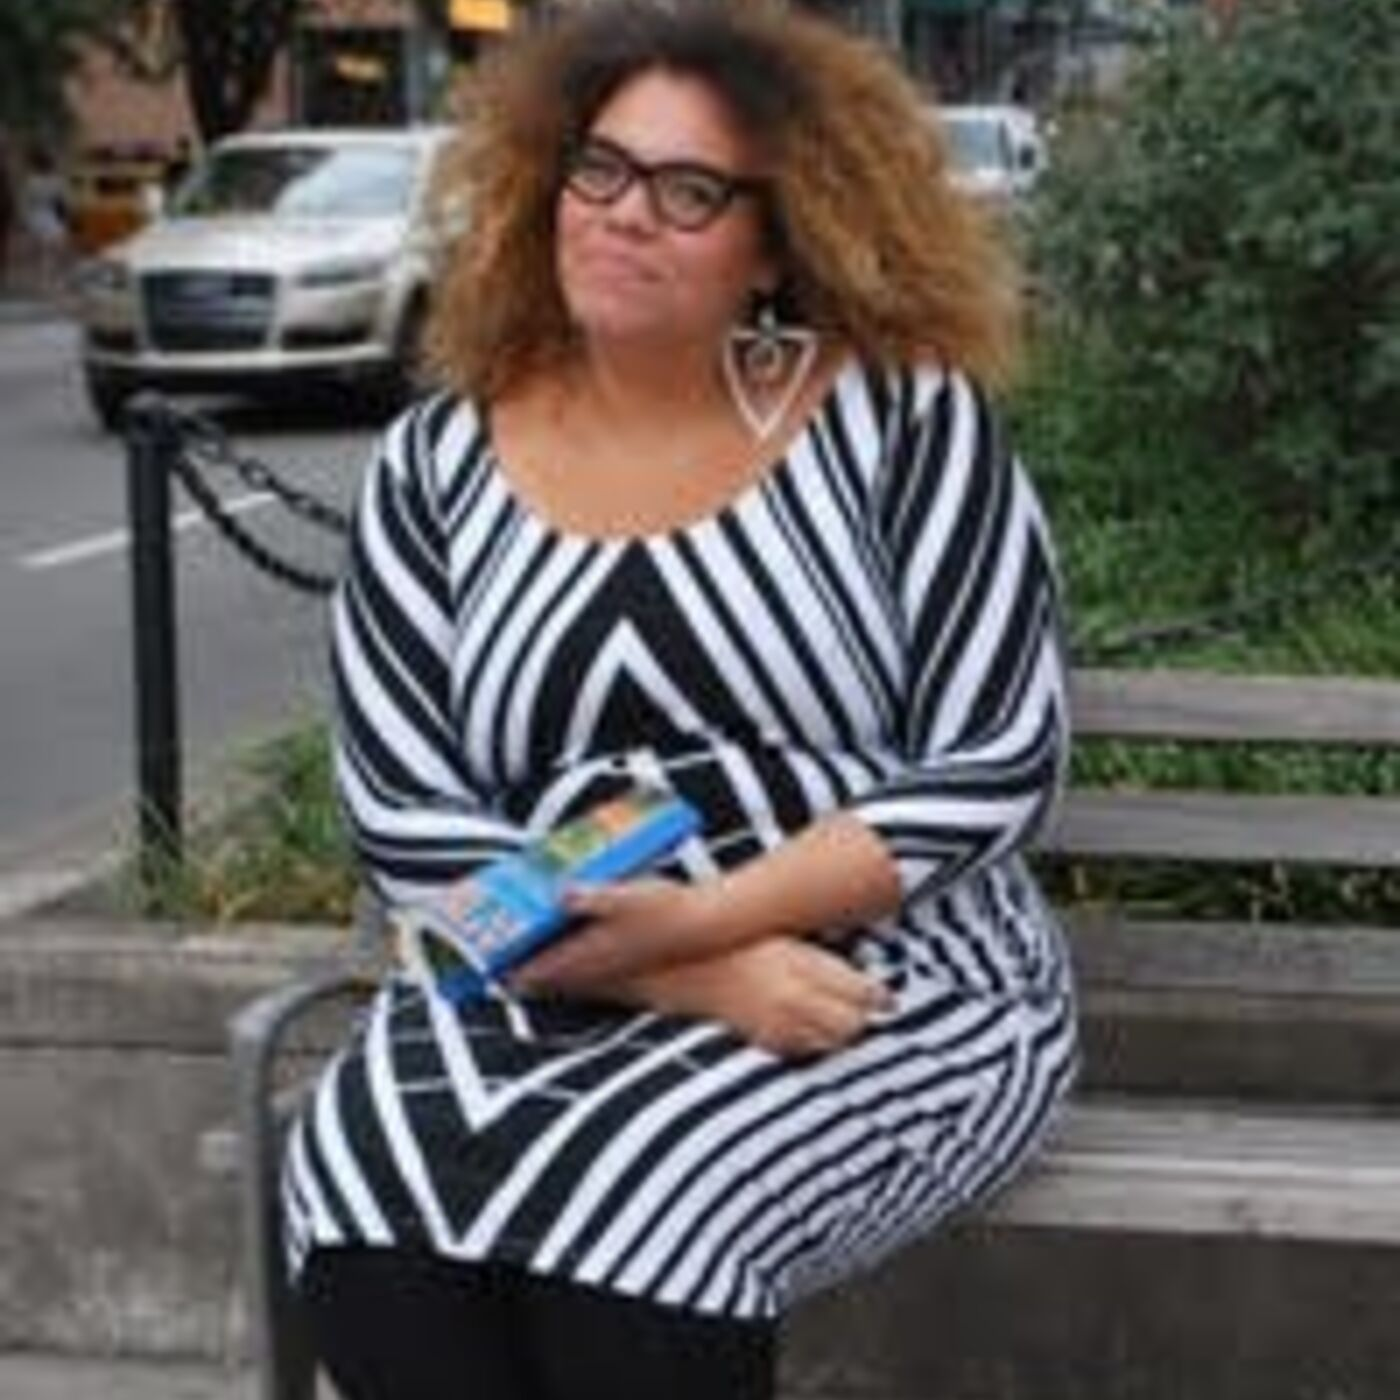 Ante up! A conversation with Bianca Laureano - Part 2